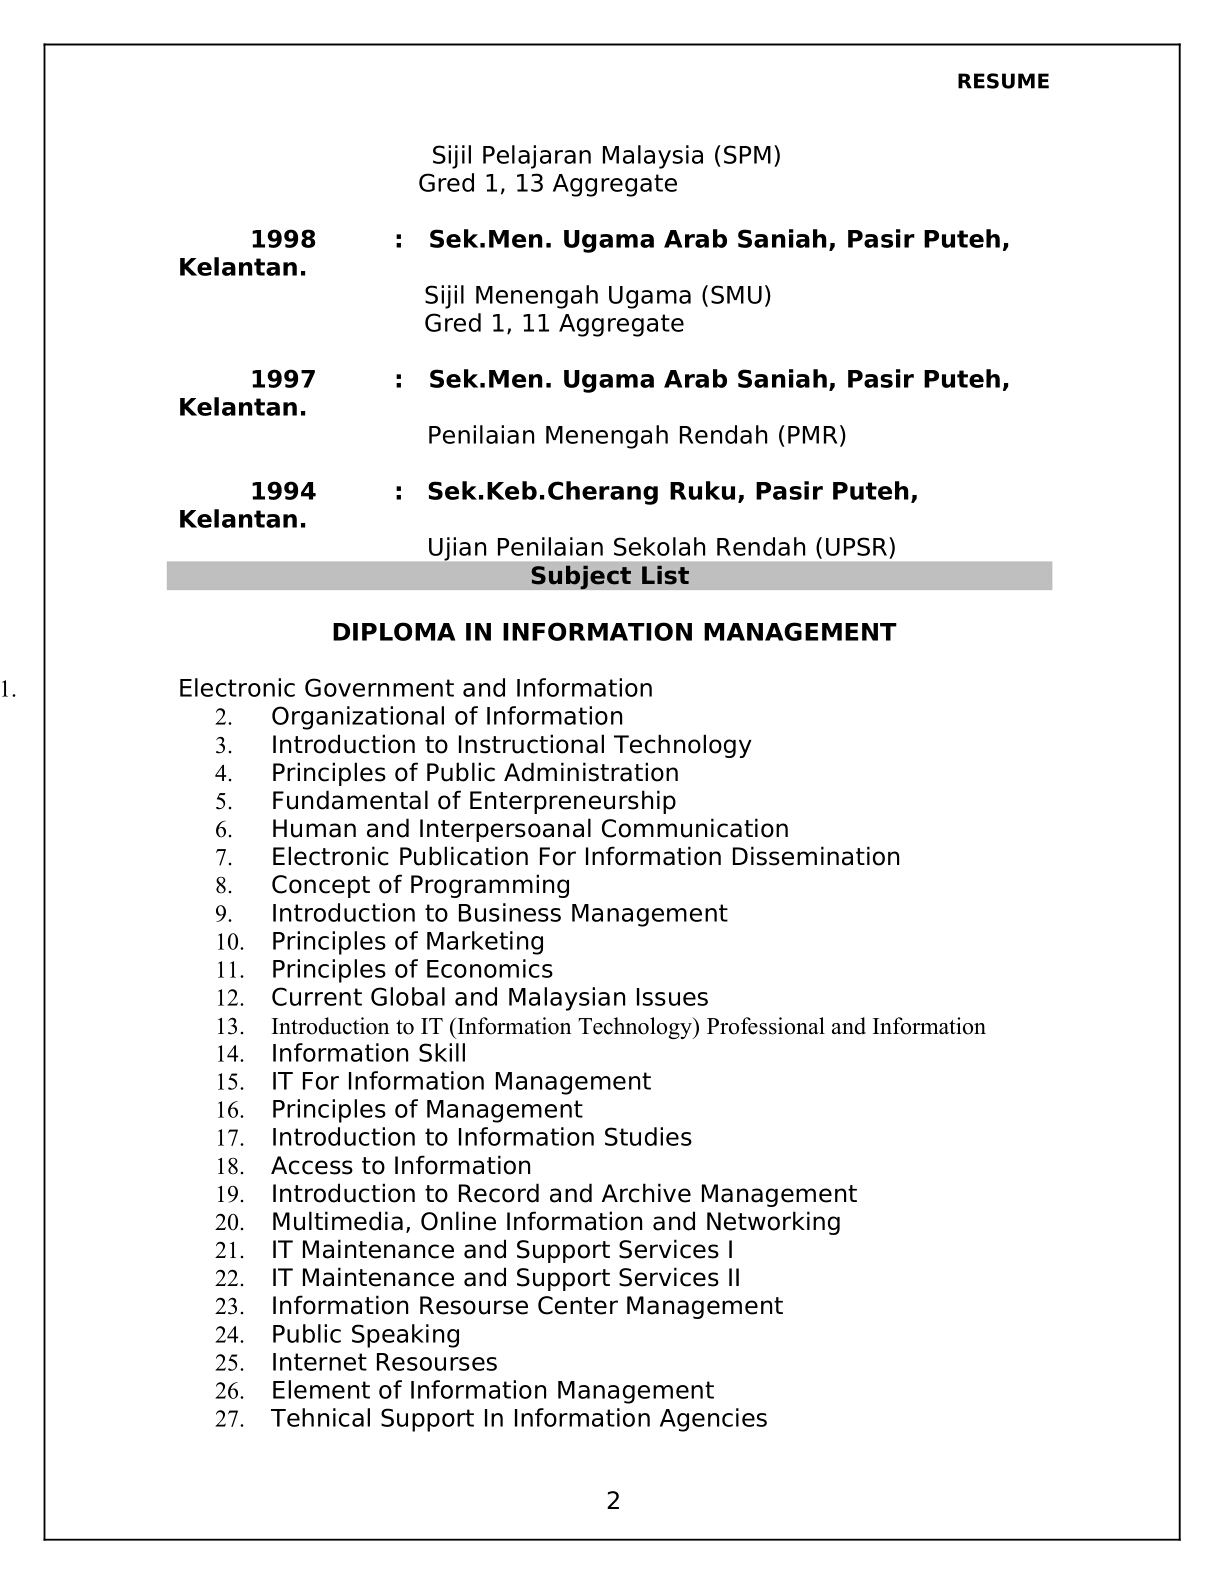 contoh resume lengkap